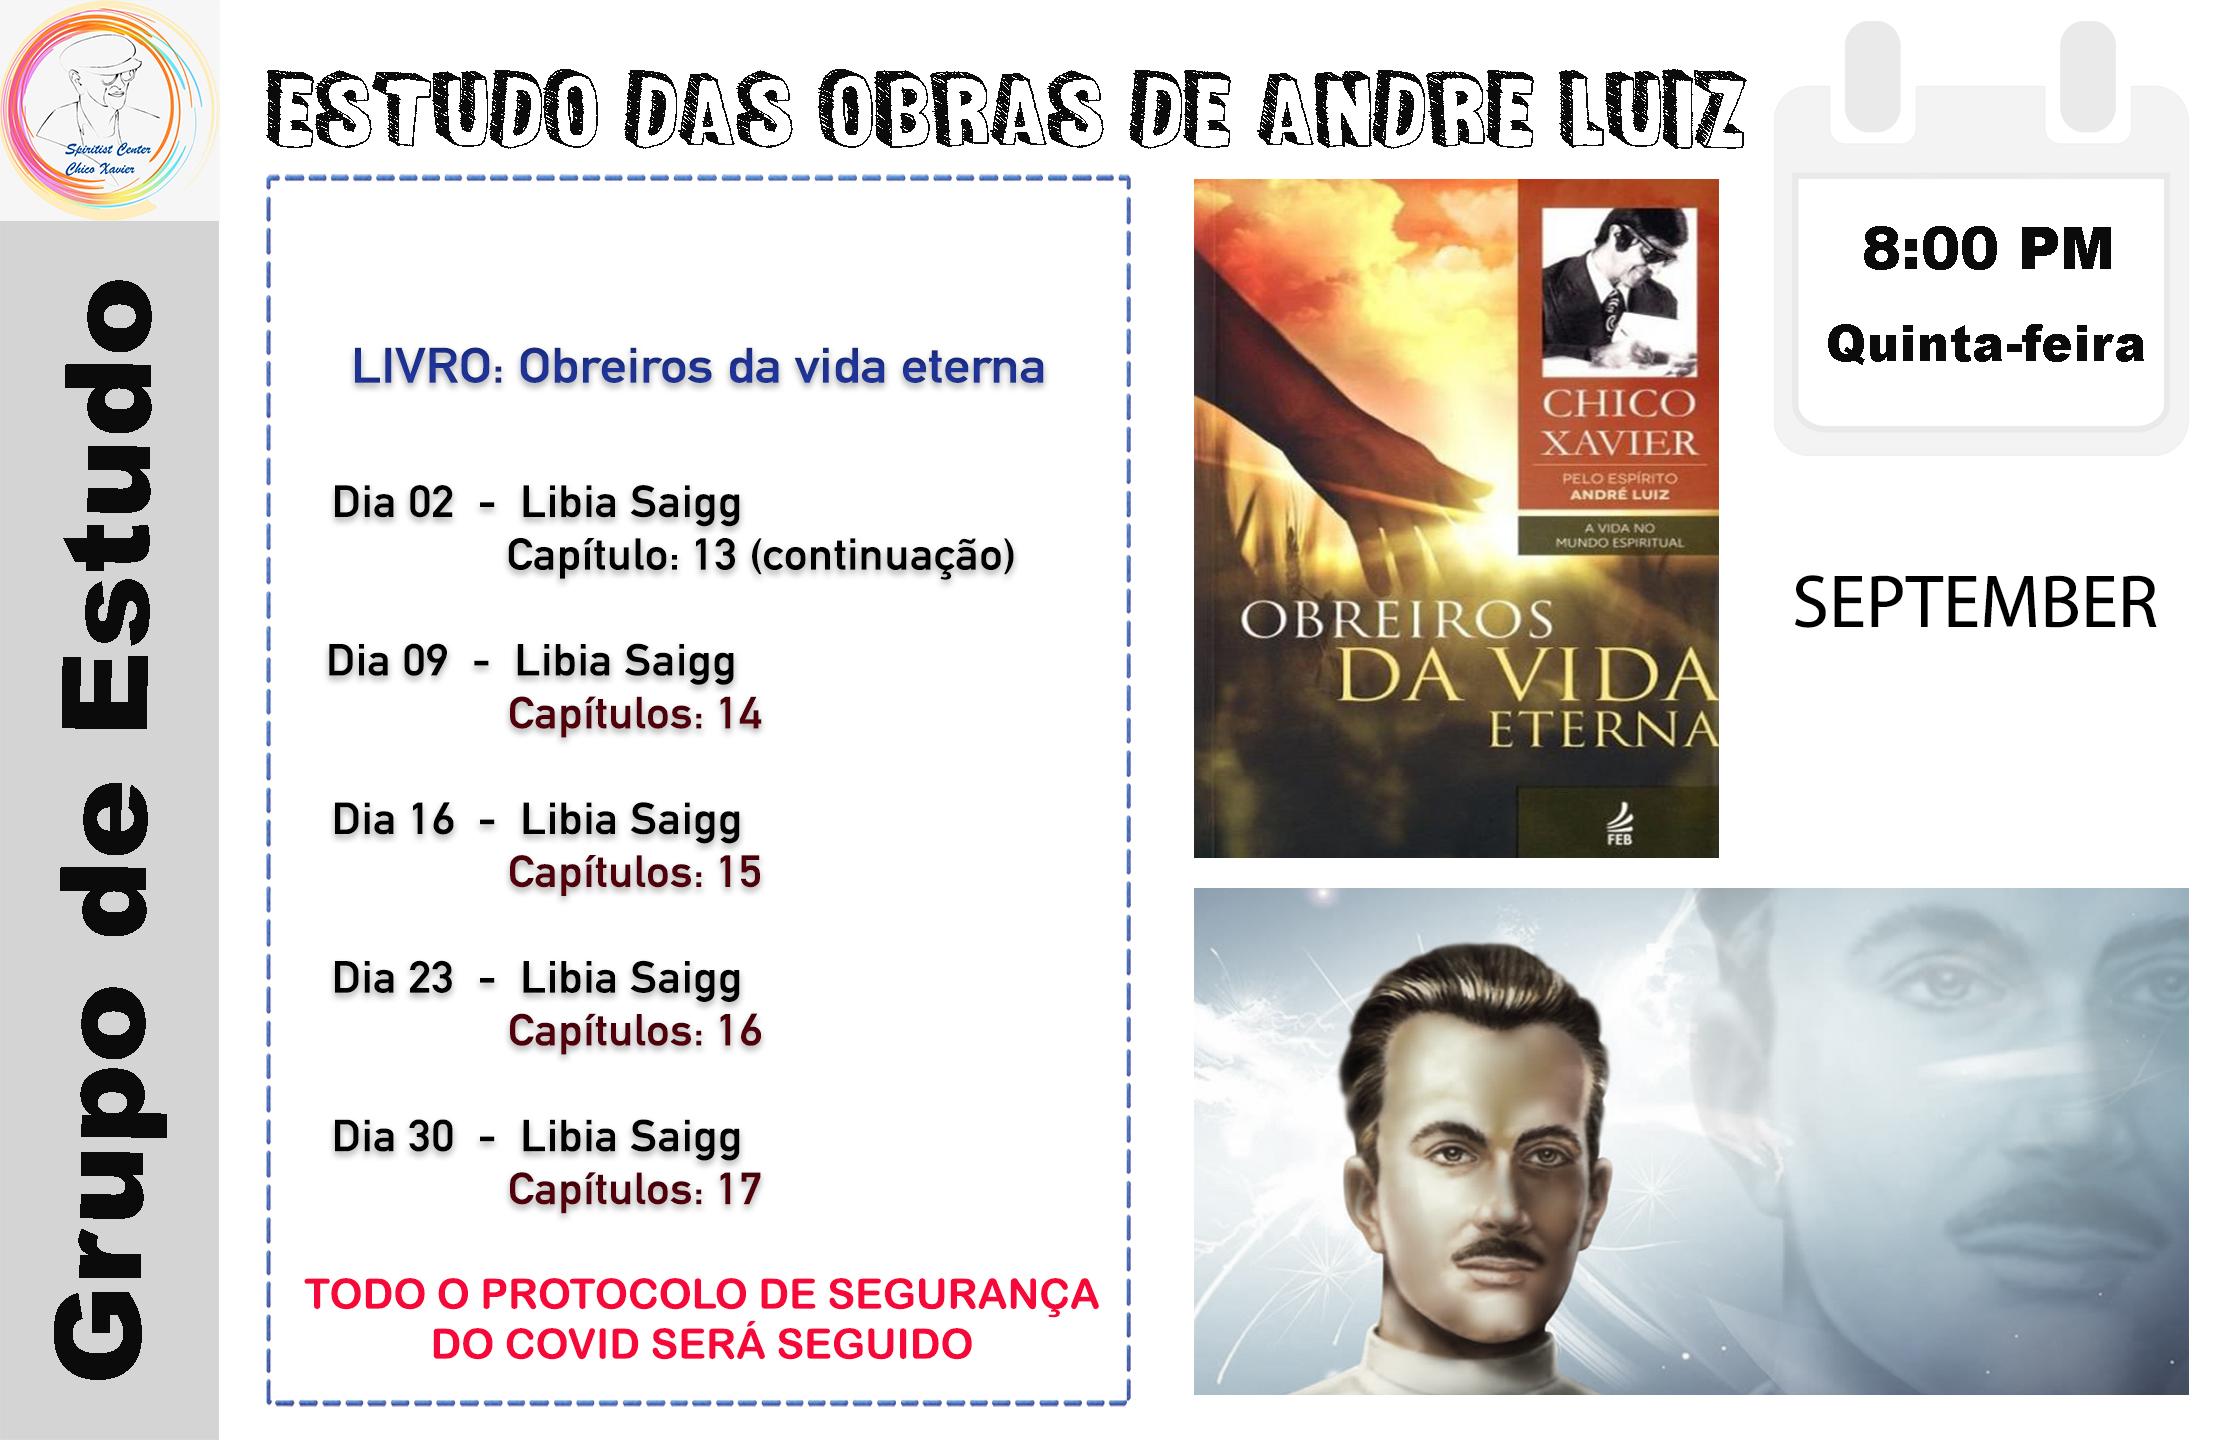 Obras de Andre Luiz September 21